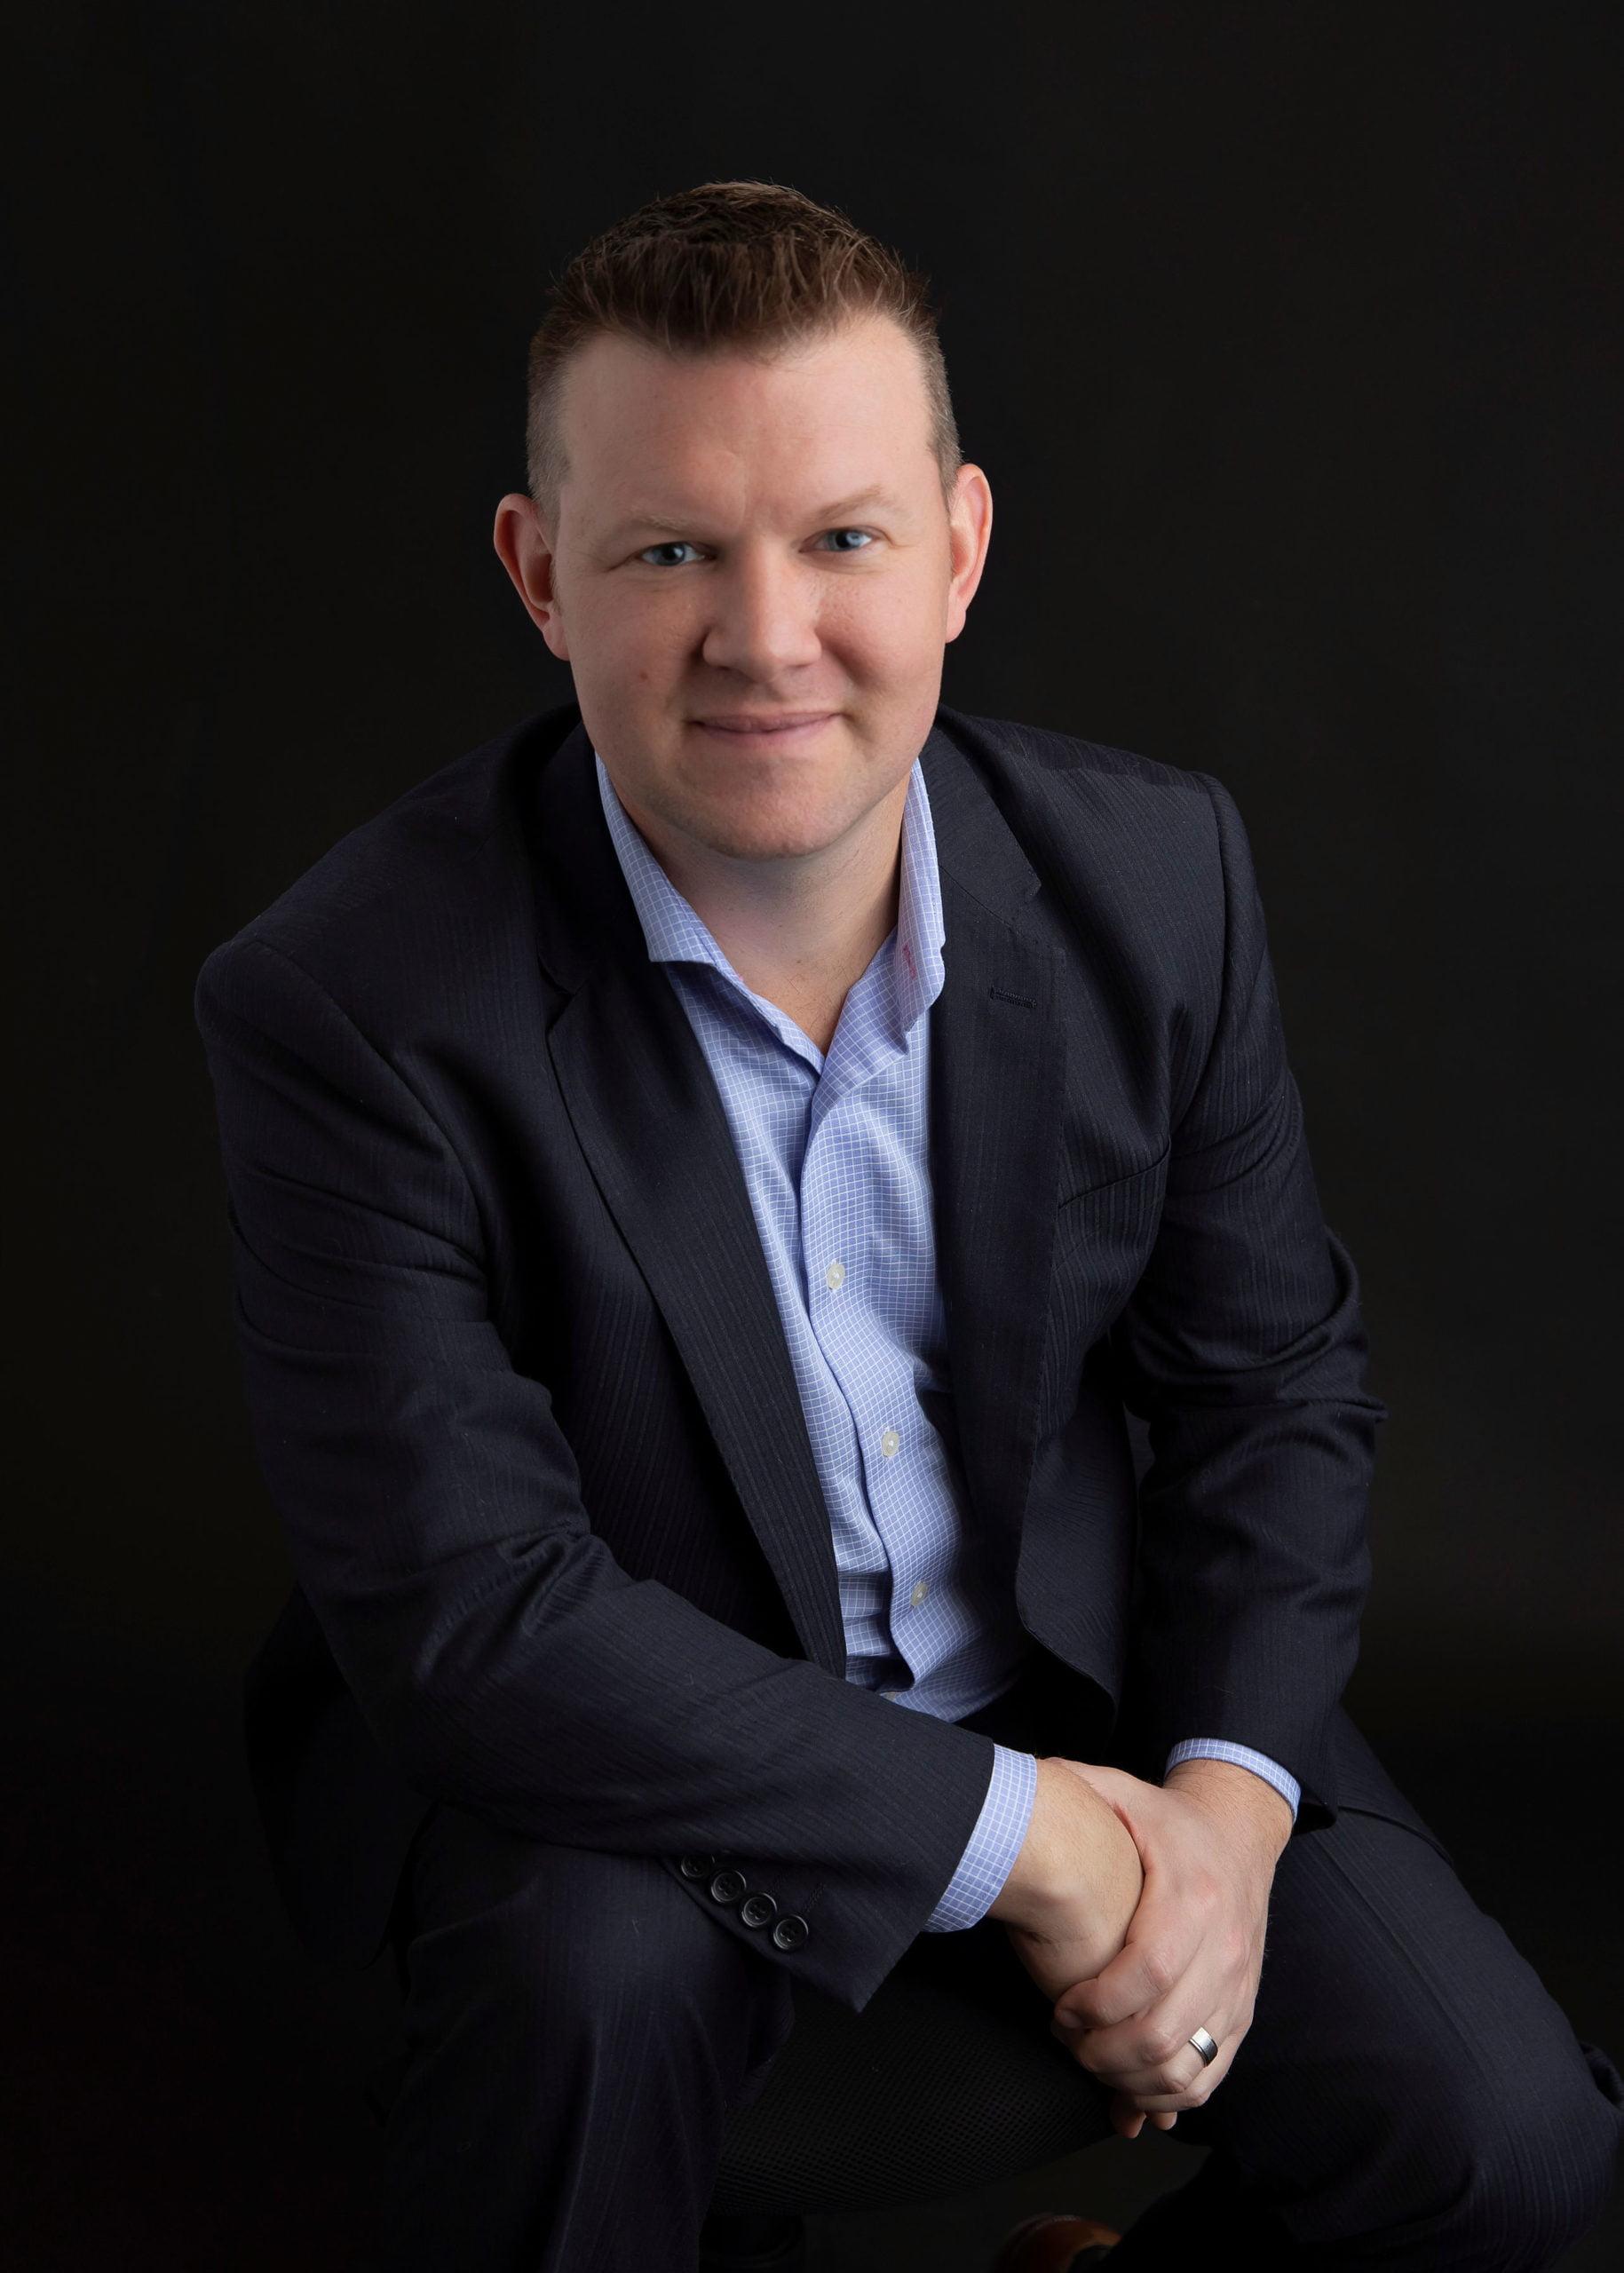 Hillmann Consulting, LLC Announces Jacob Hillmann as Newest Partner